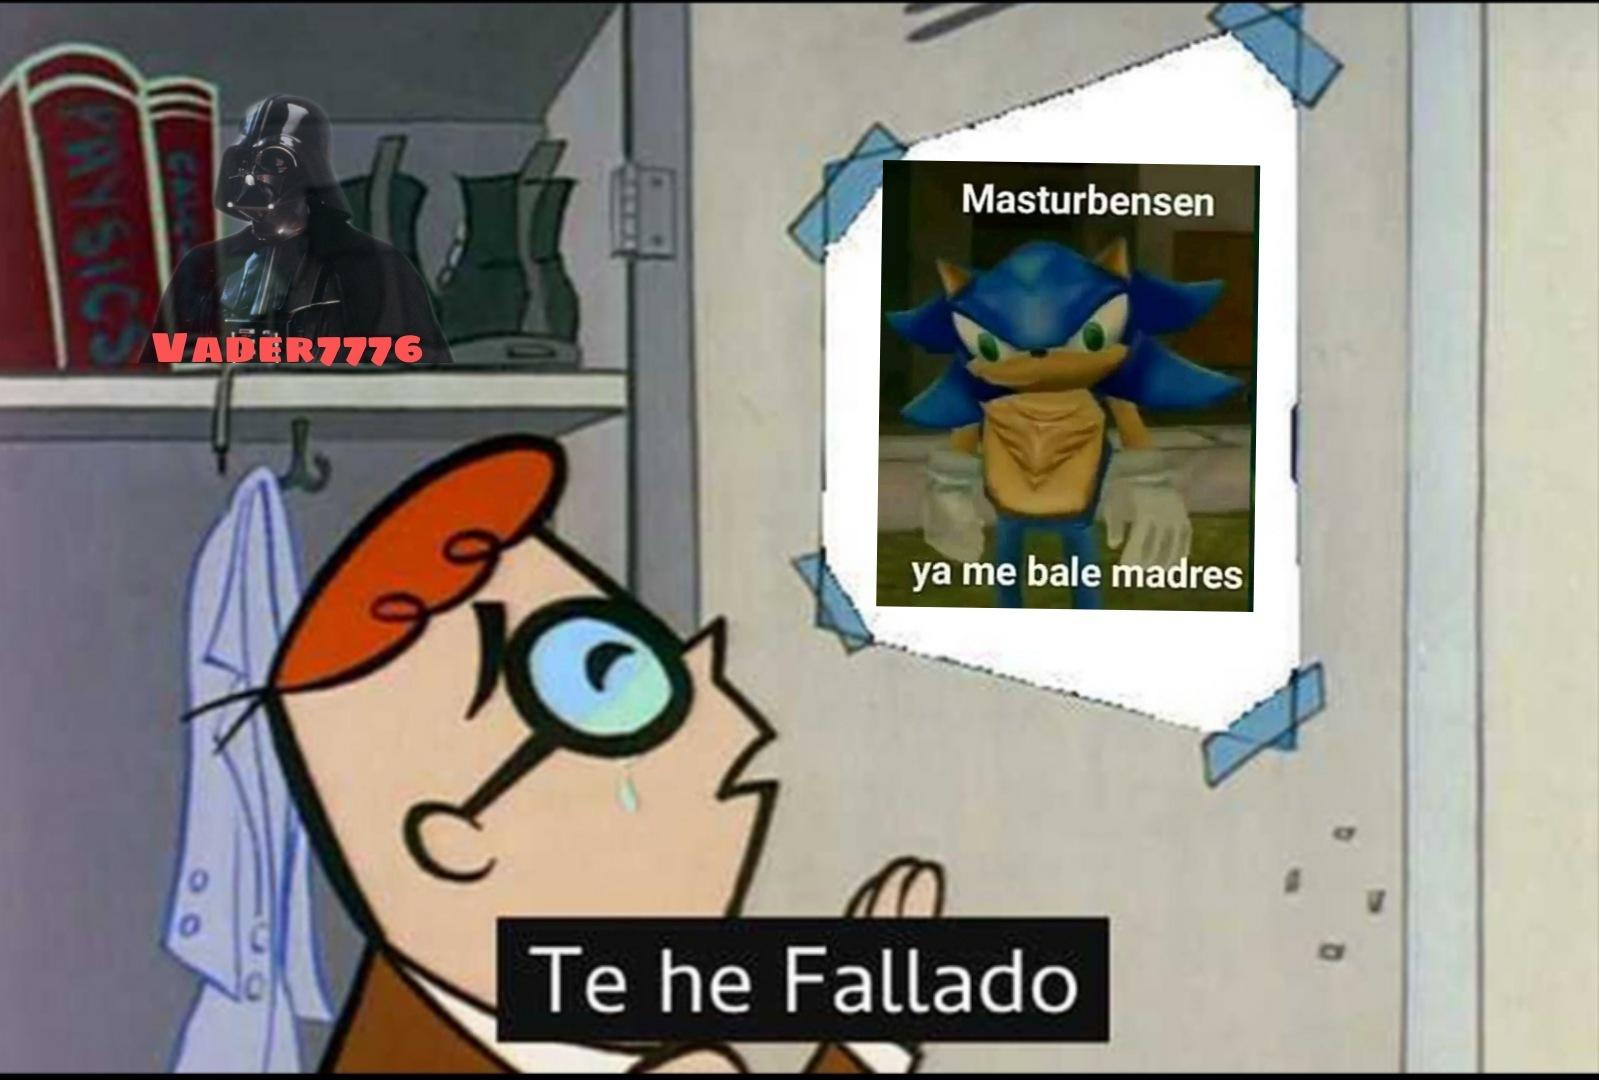 Le fallamos :( - meme